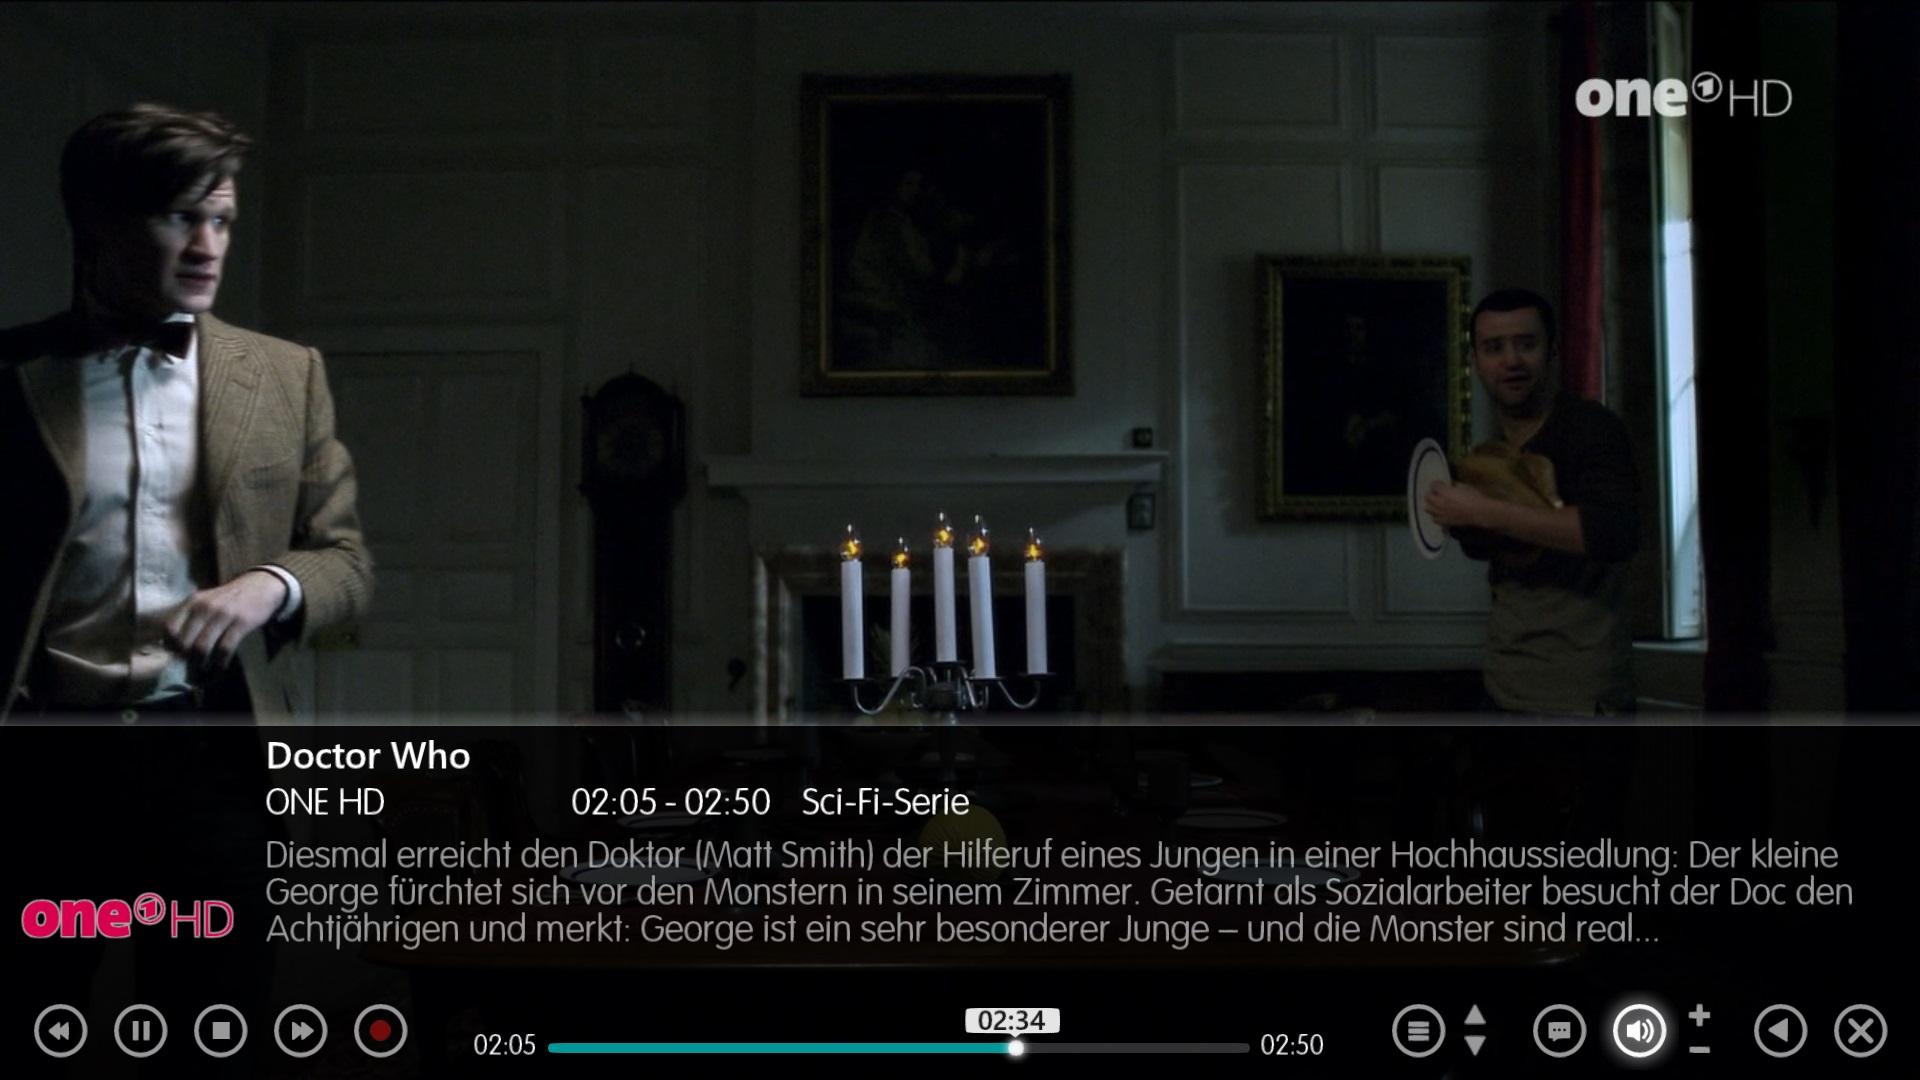 FullscreenTVOSD.jpg